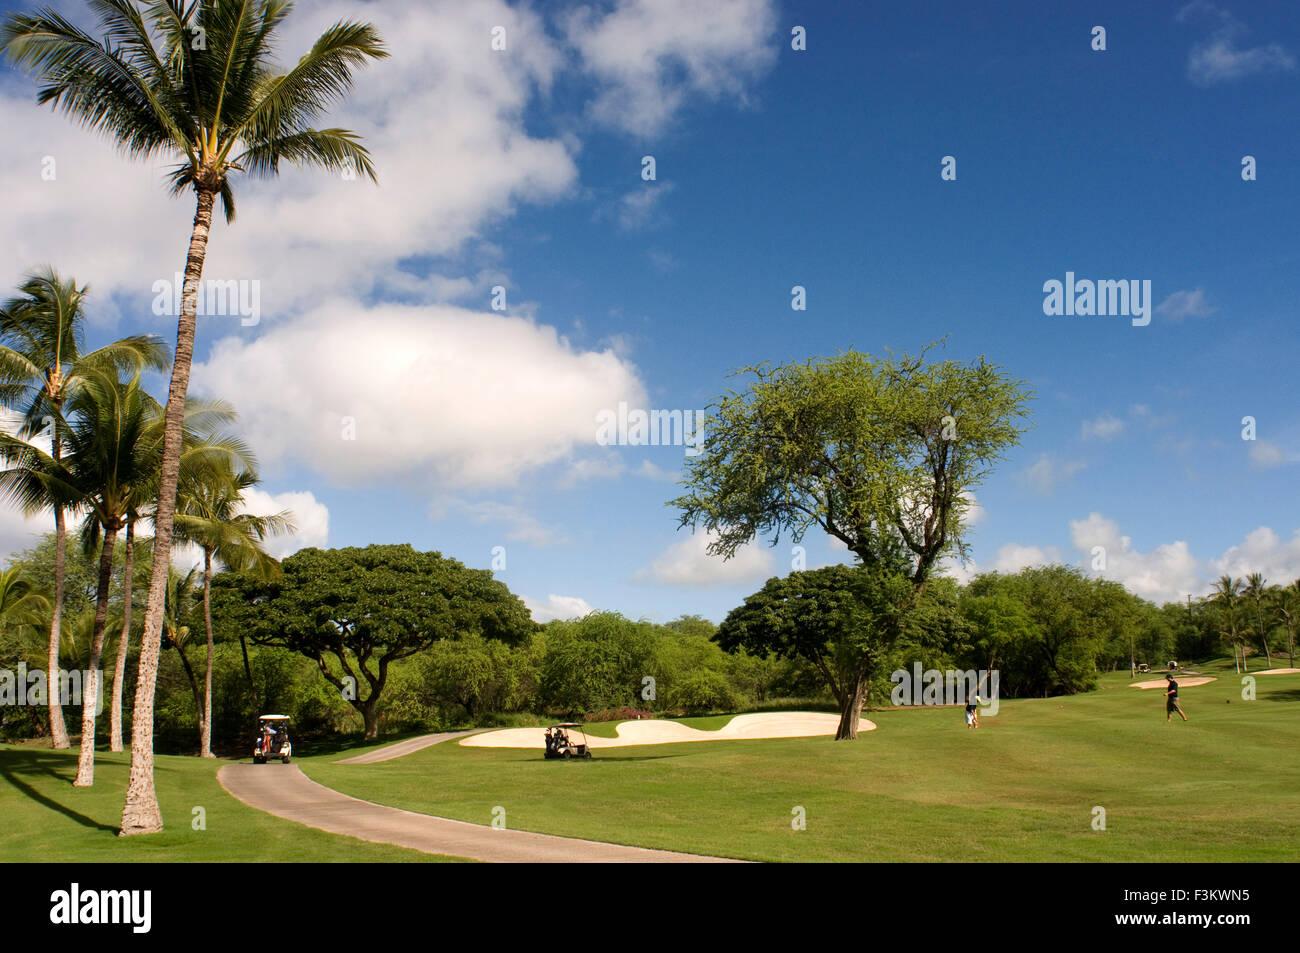 Golf Course in Wailea Hawaii Makena Beach